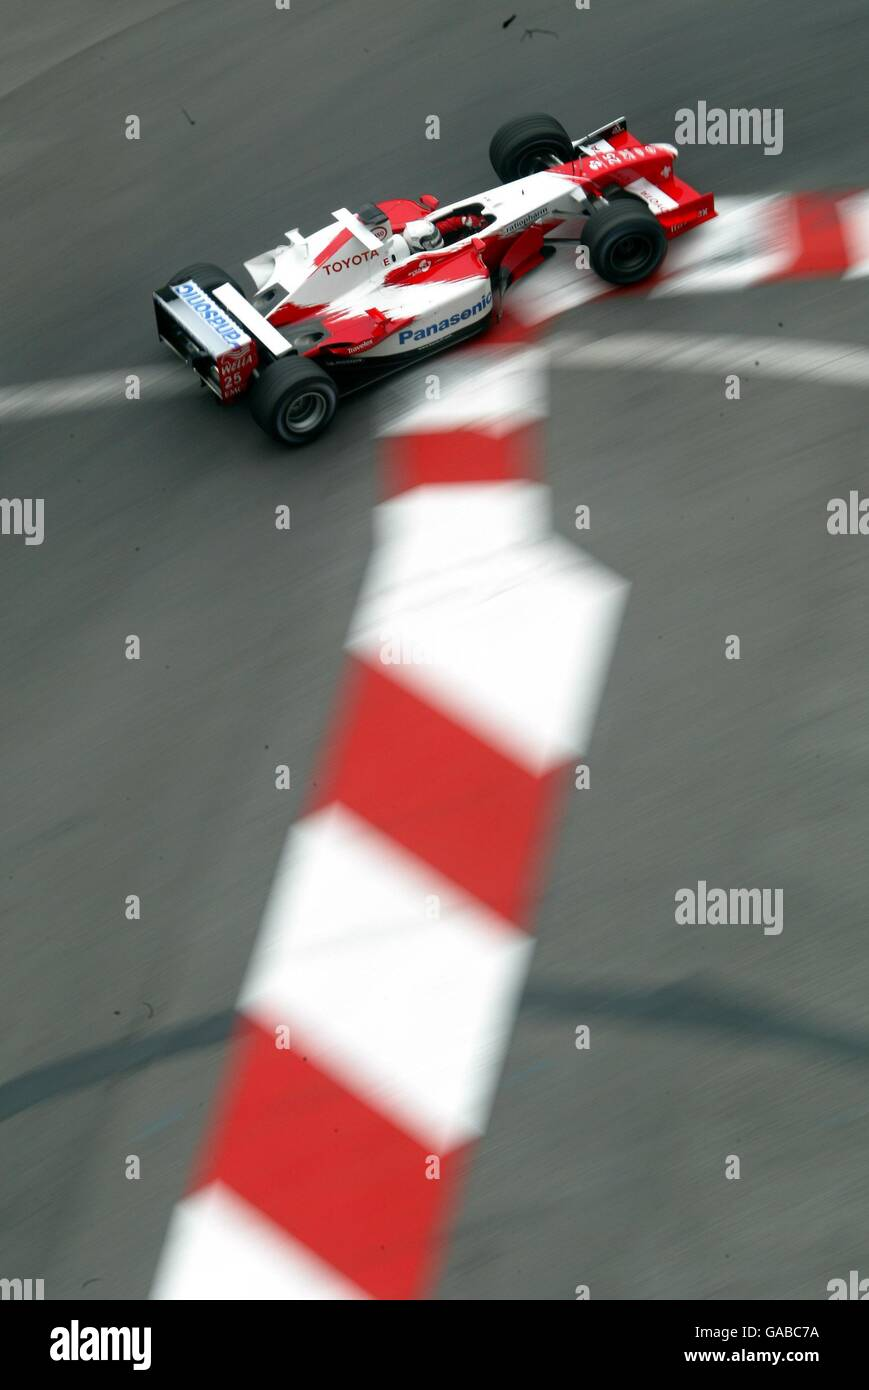 Formula One Motor Racing - Monaco Grand Prix - Practice Stock Photo